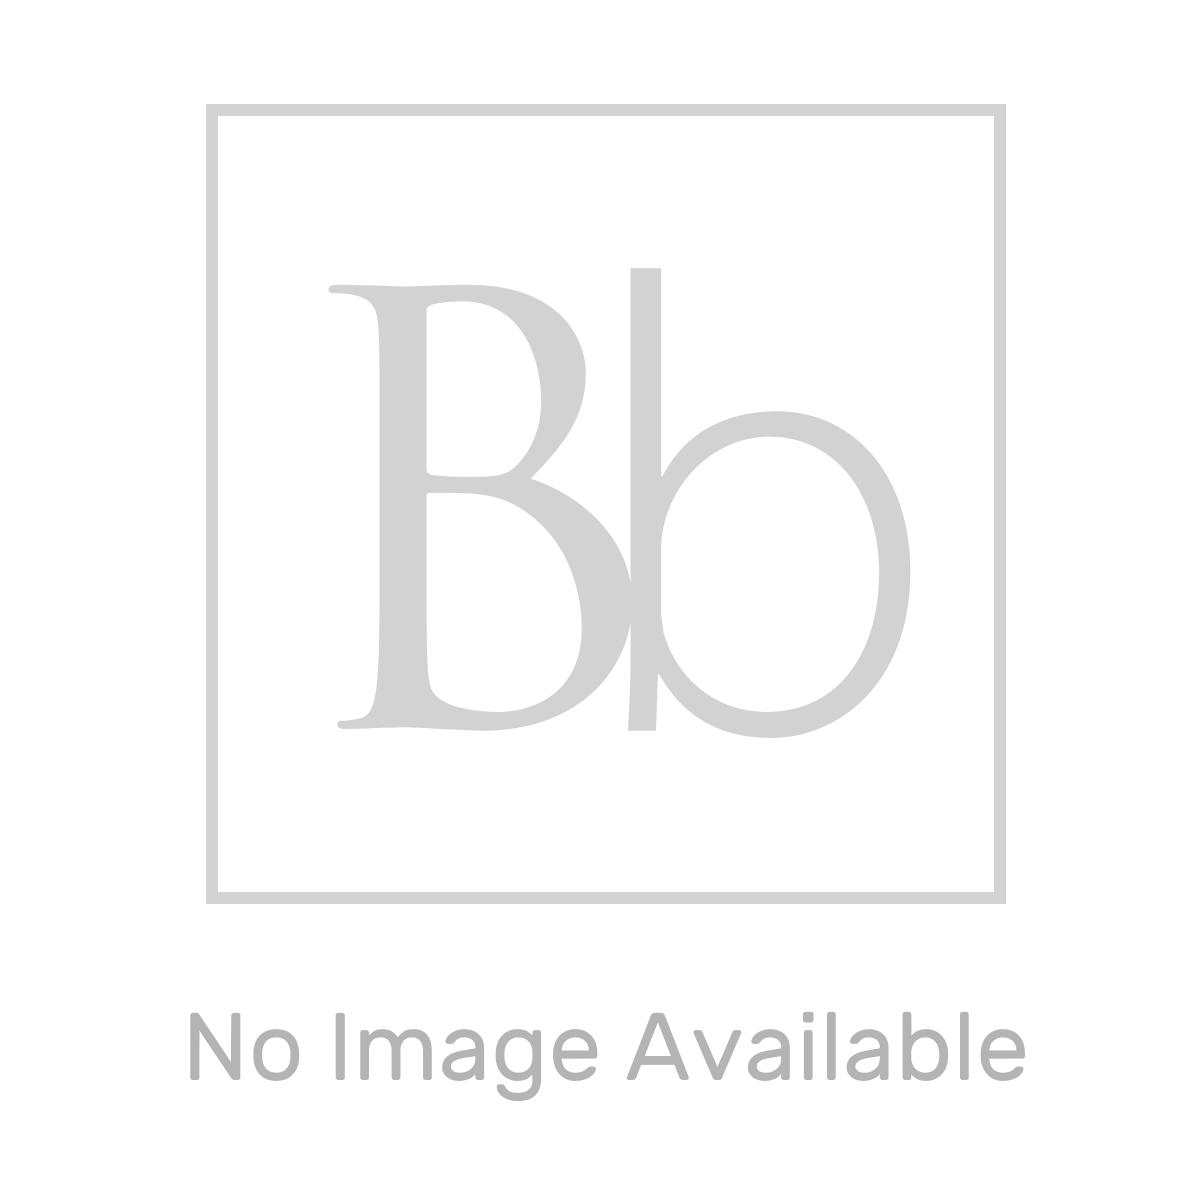 Moods Plain White Deluxe Acrylic Bath Panel 1800mm